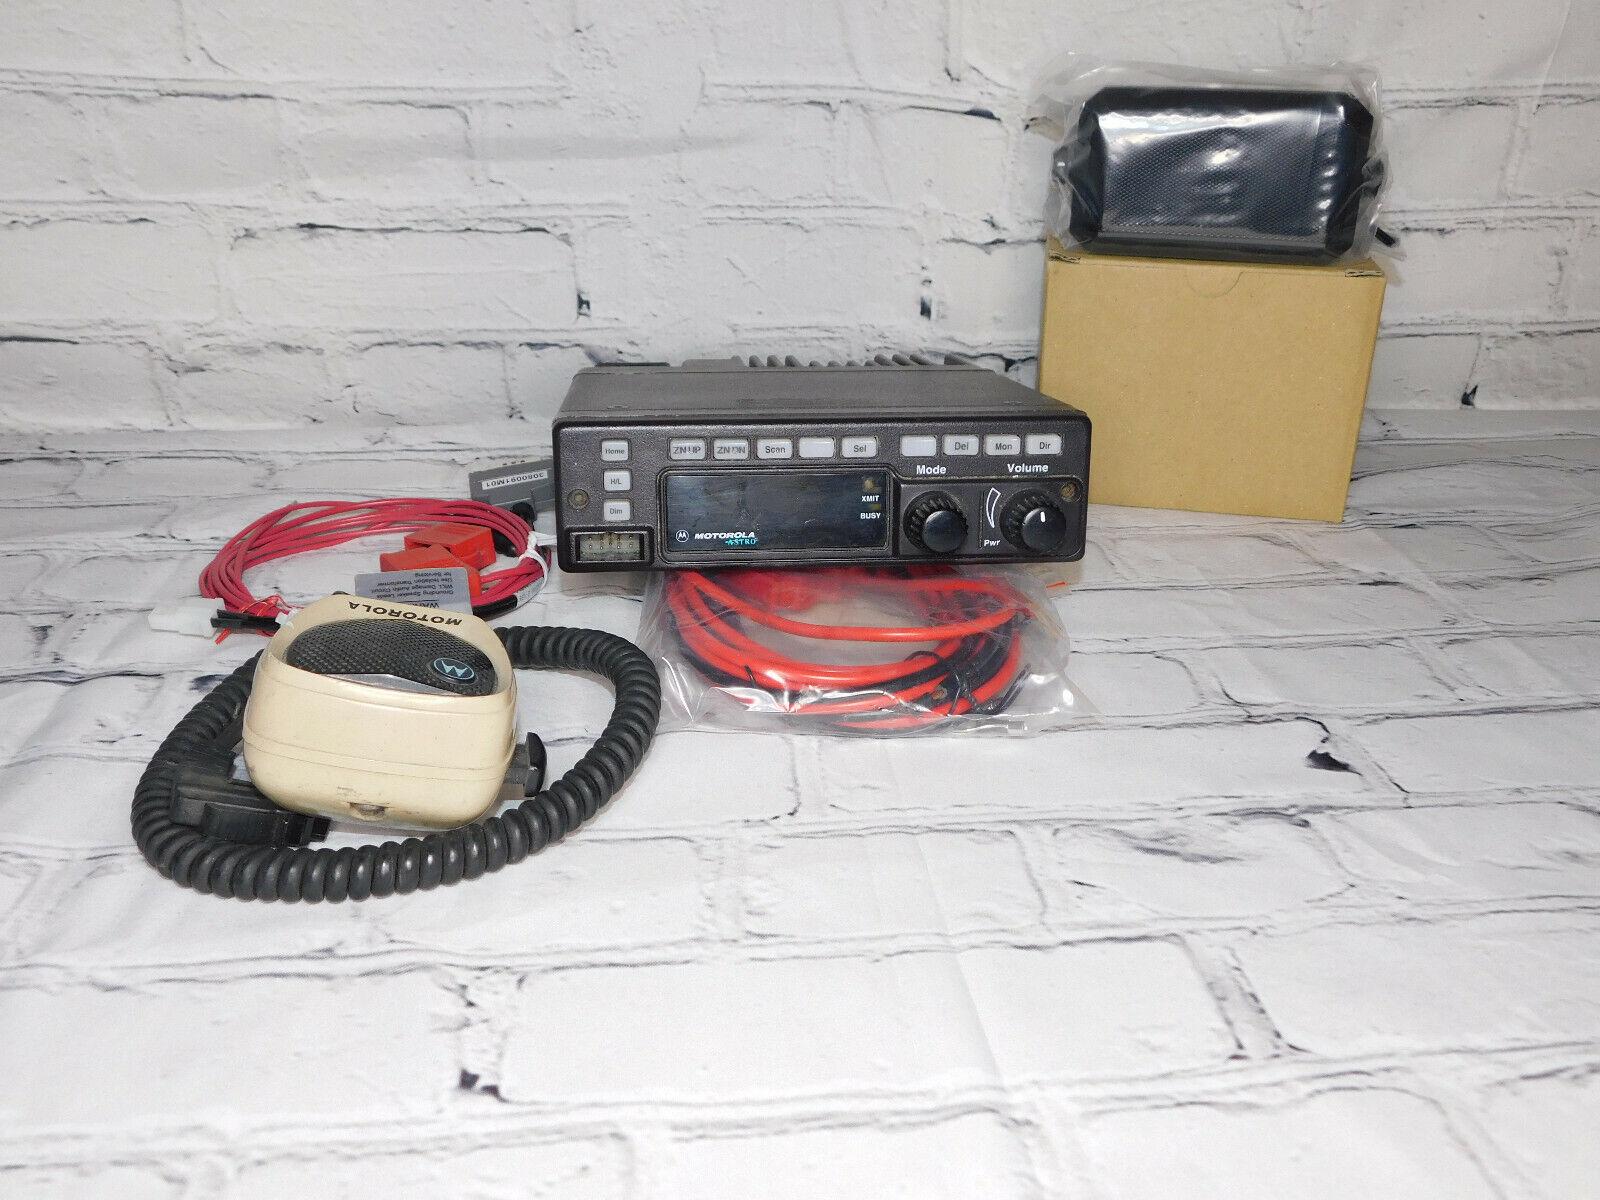 Motorola VHF Astro spectra W4 P25 Digital Mobile radio W/ AES/DES Encryption . Buy it now for 195.00